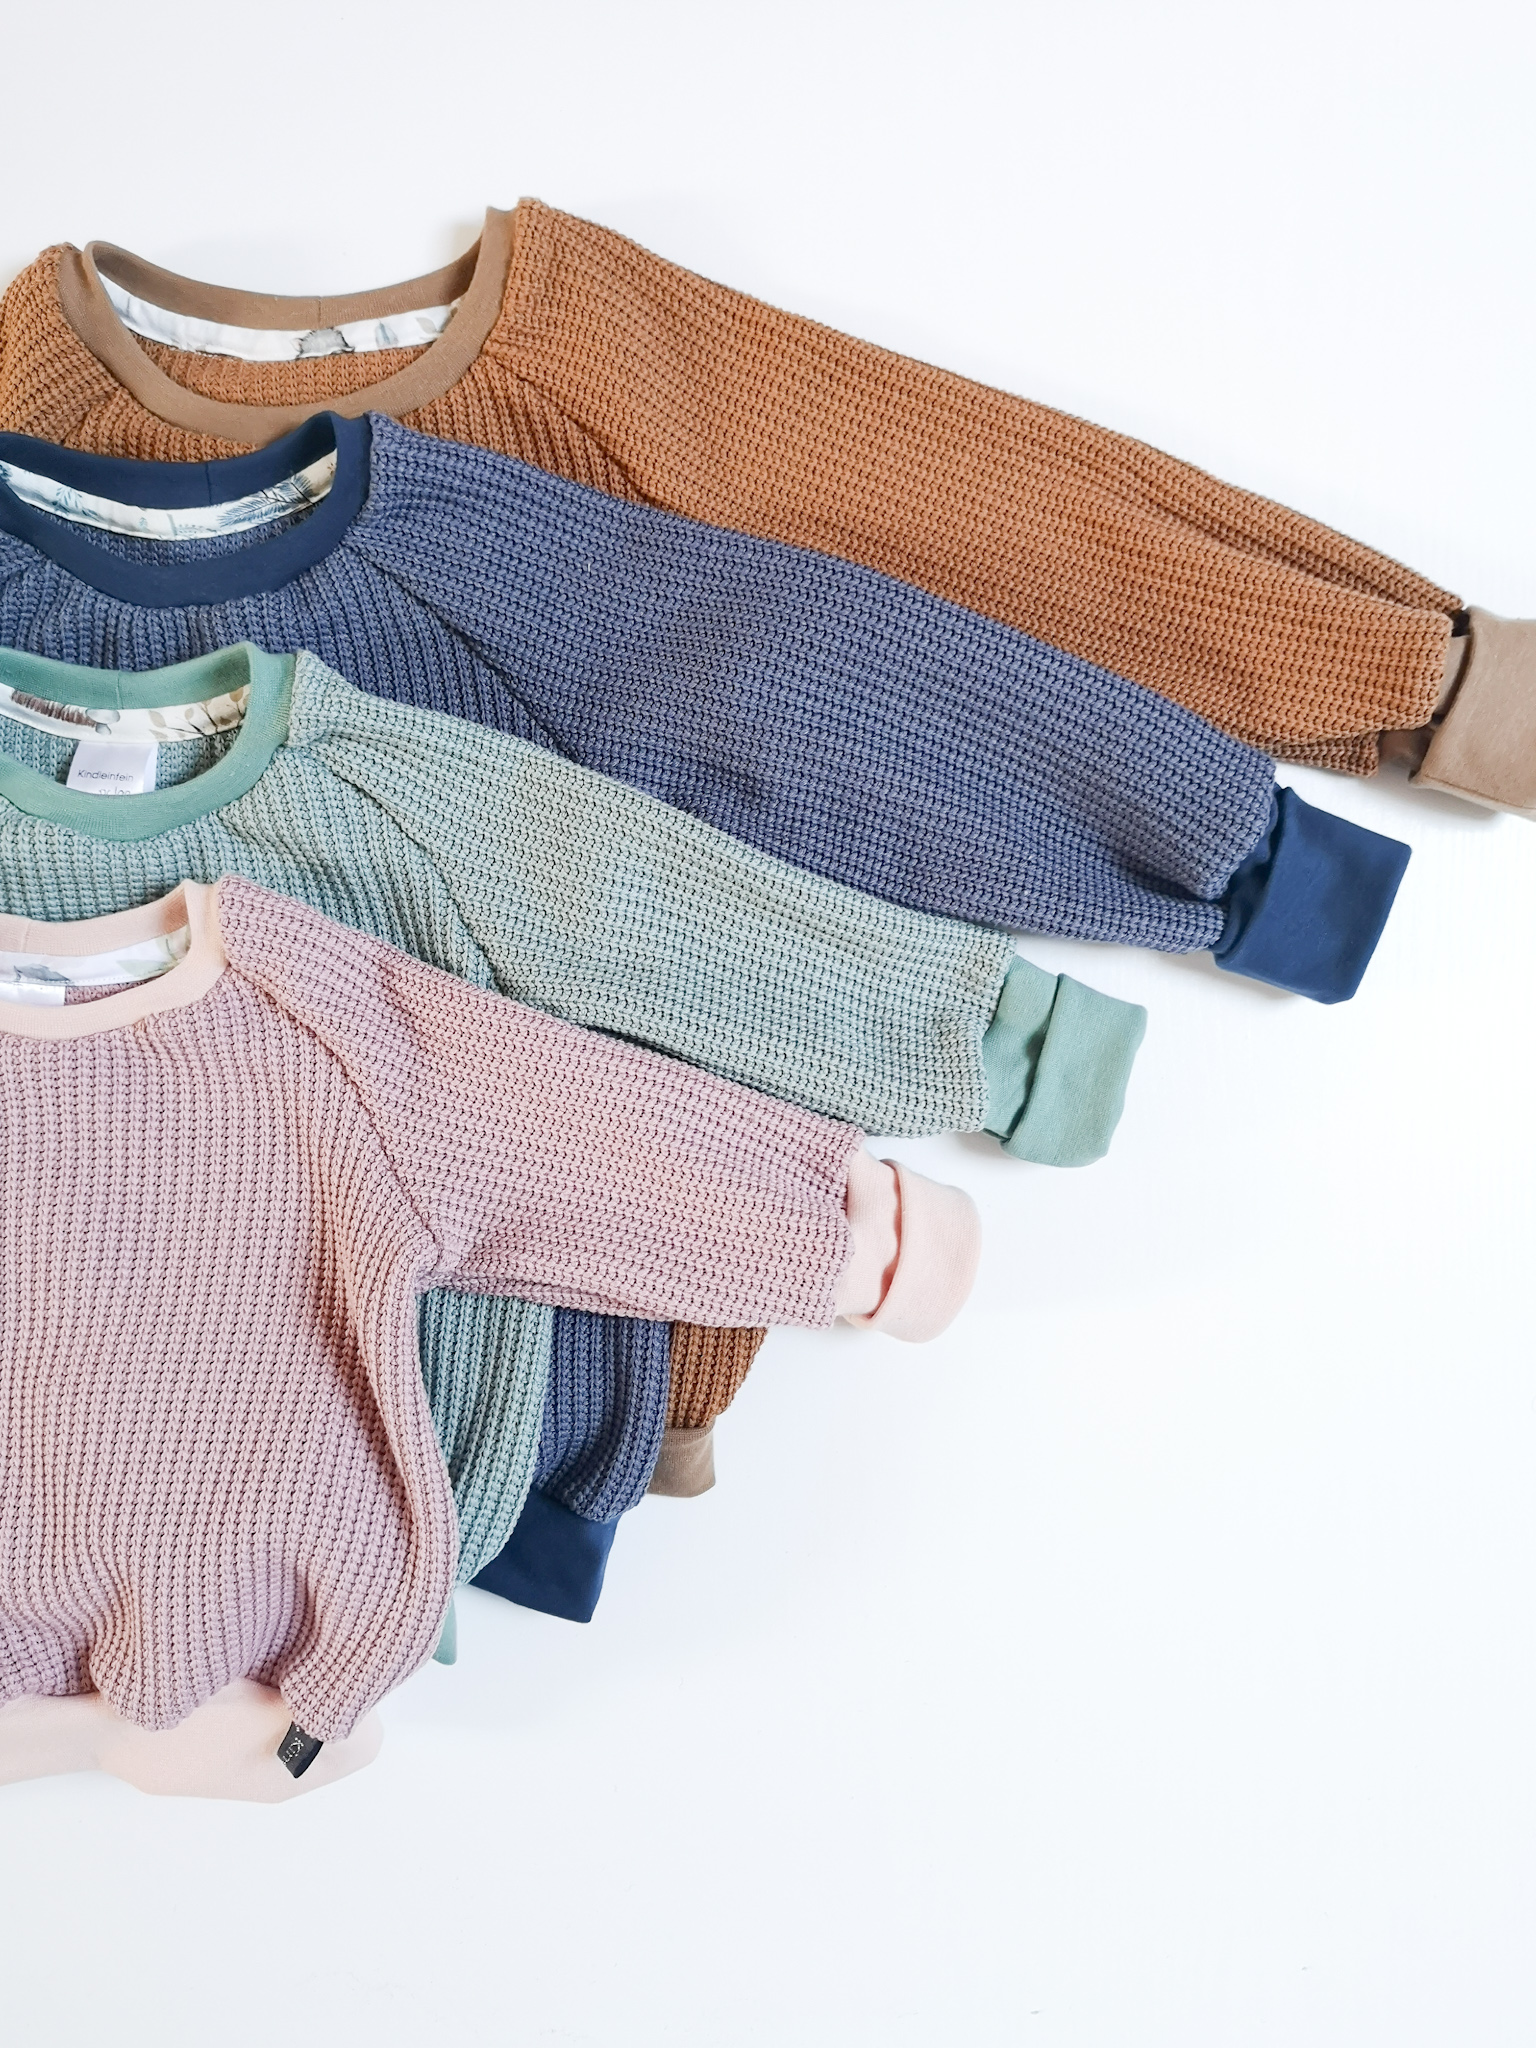 NEU: Grobstrick Sweater